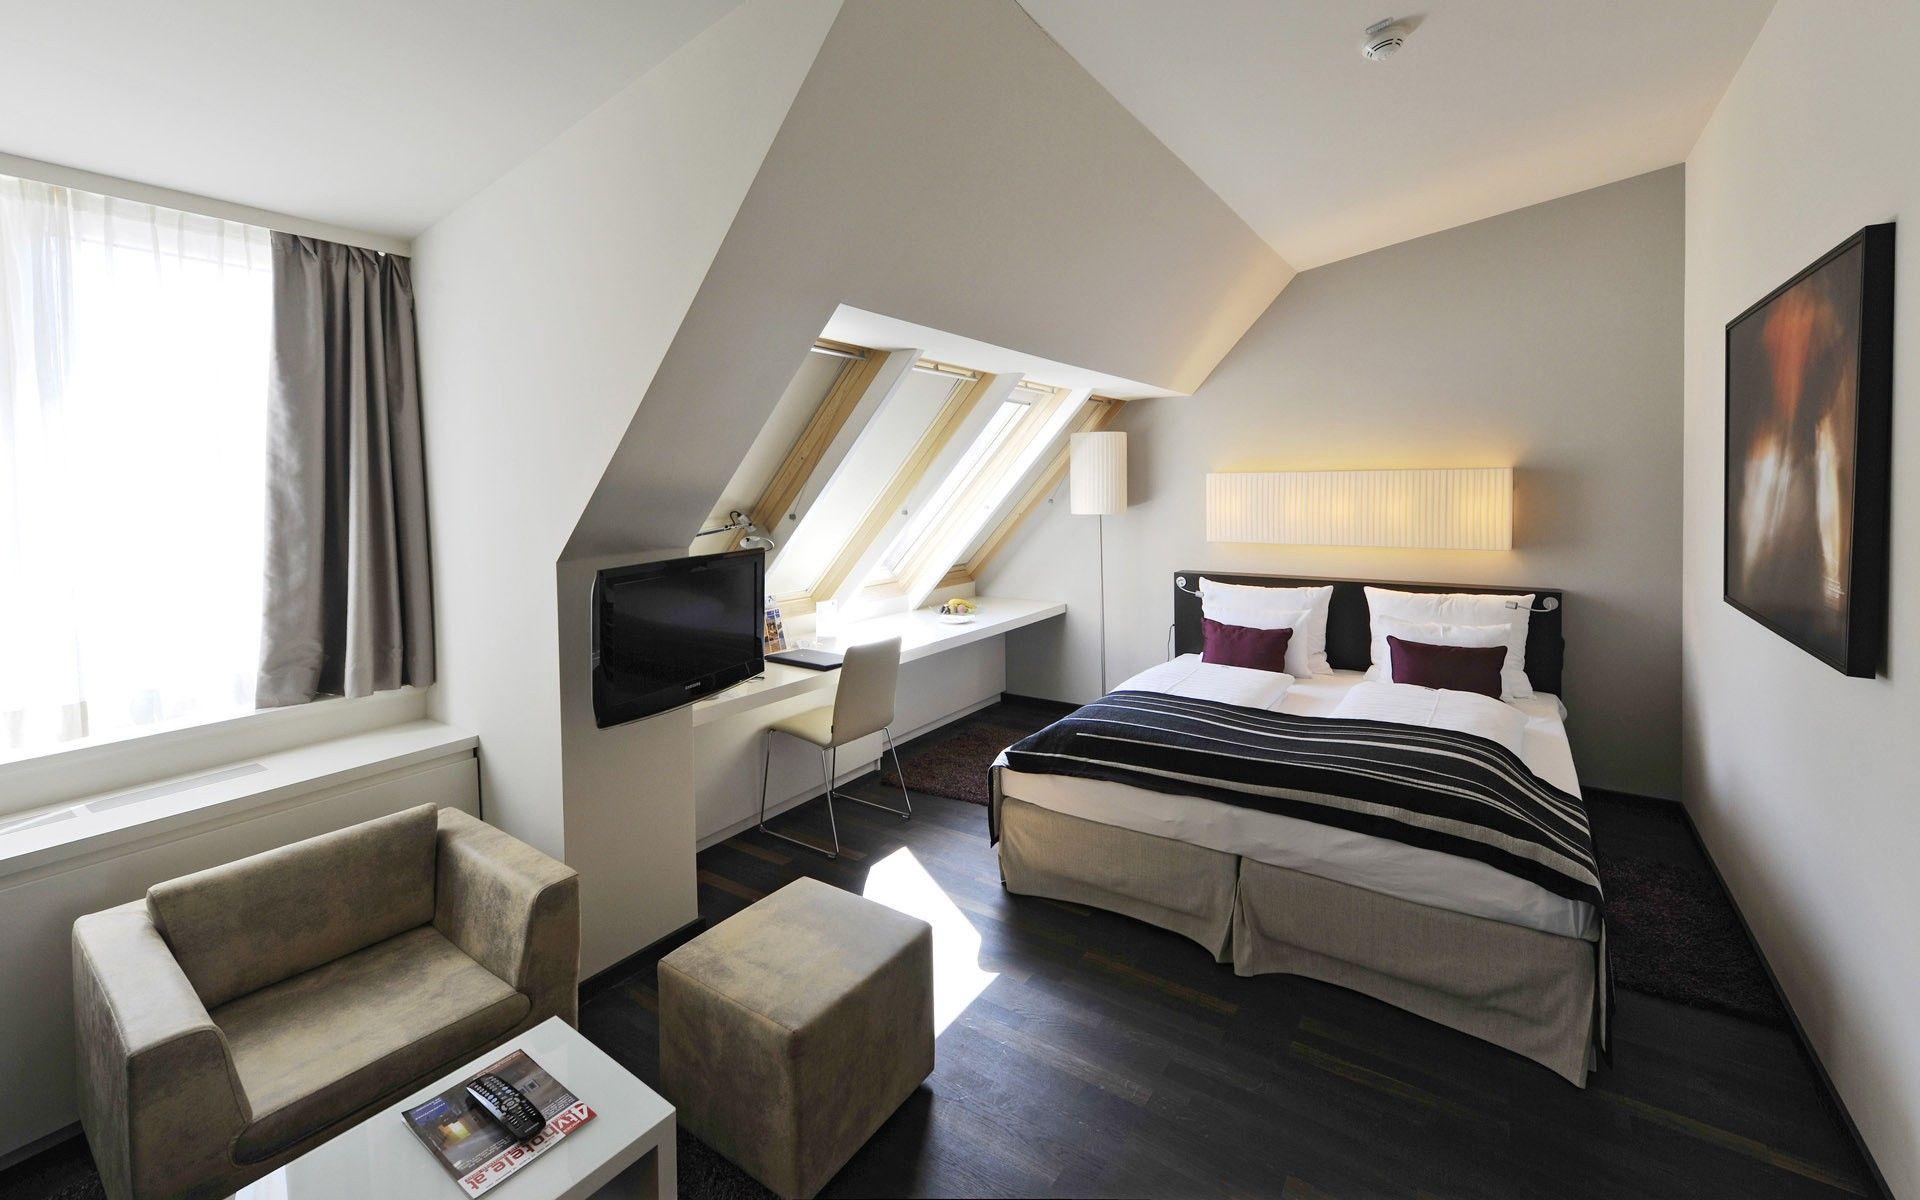 Modern Architecture Bedroom Design Interior Home Interior